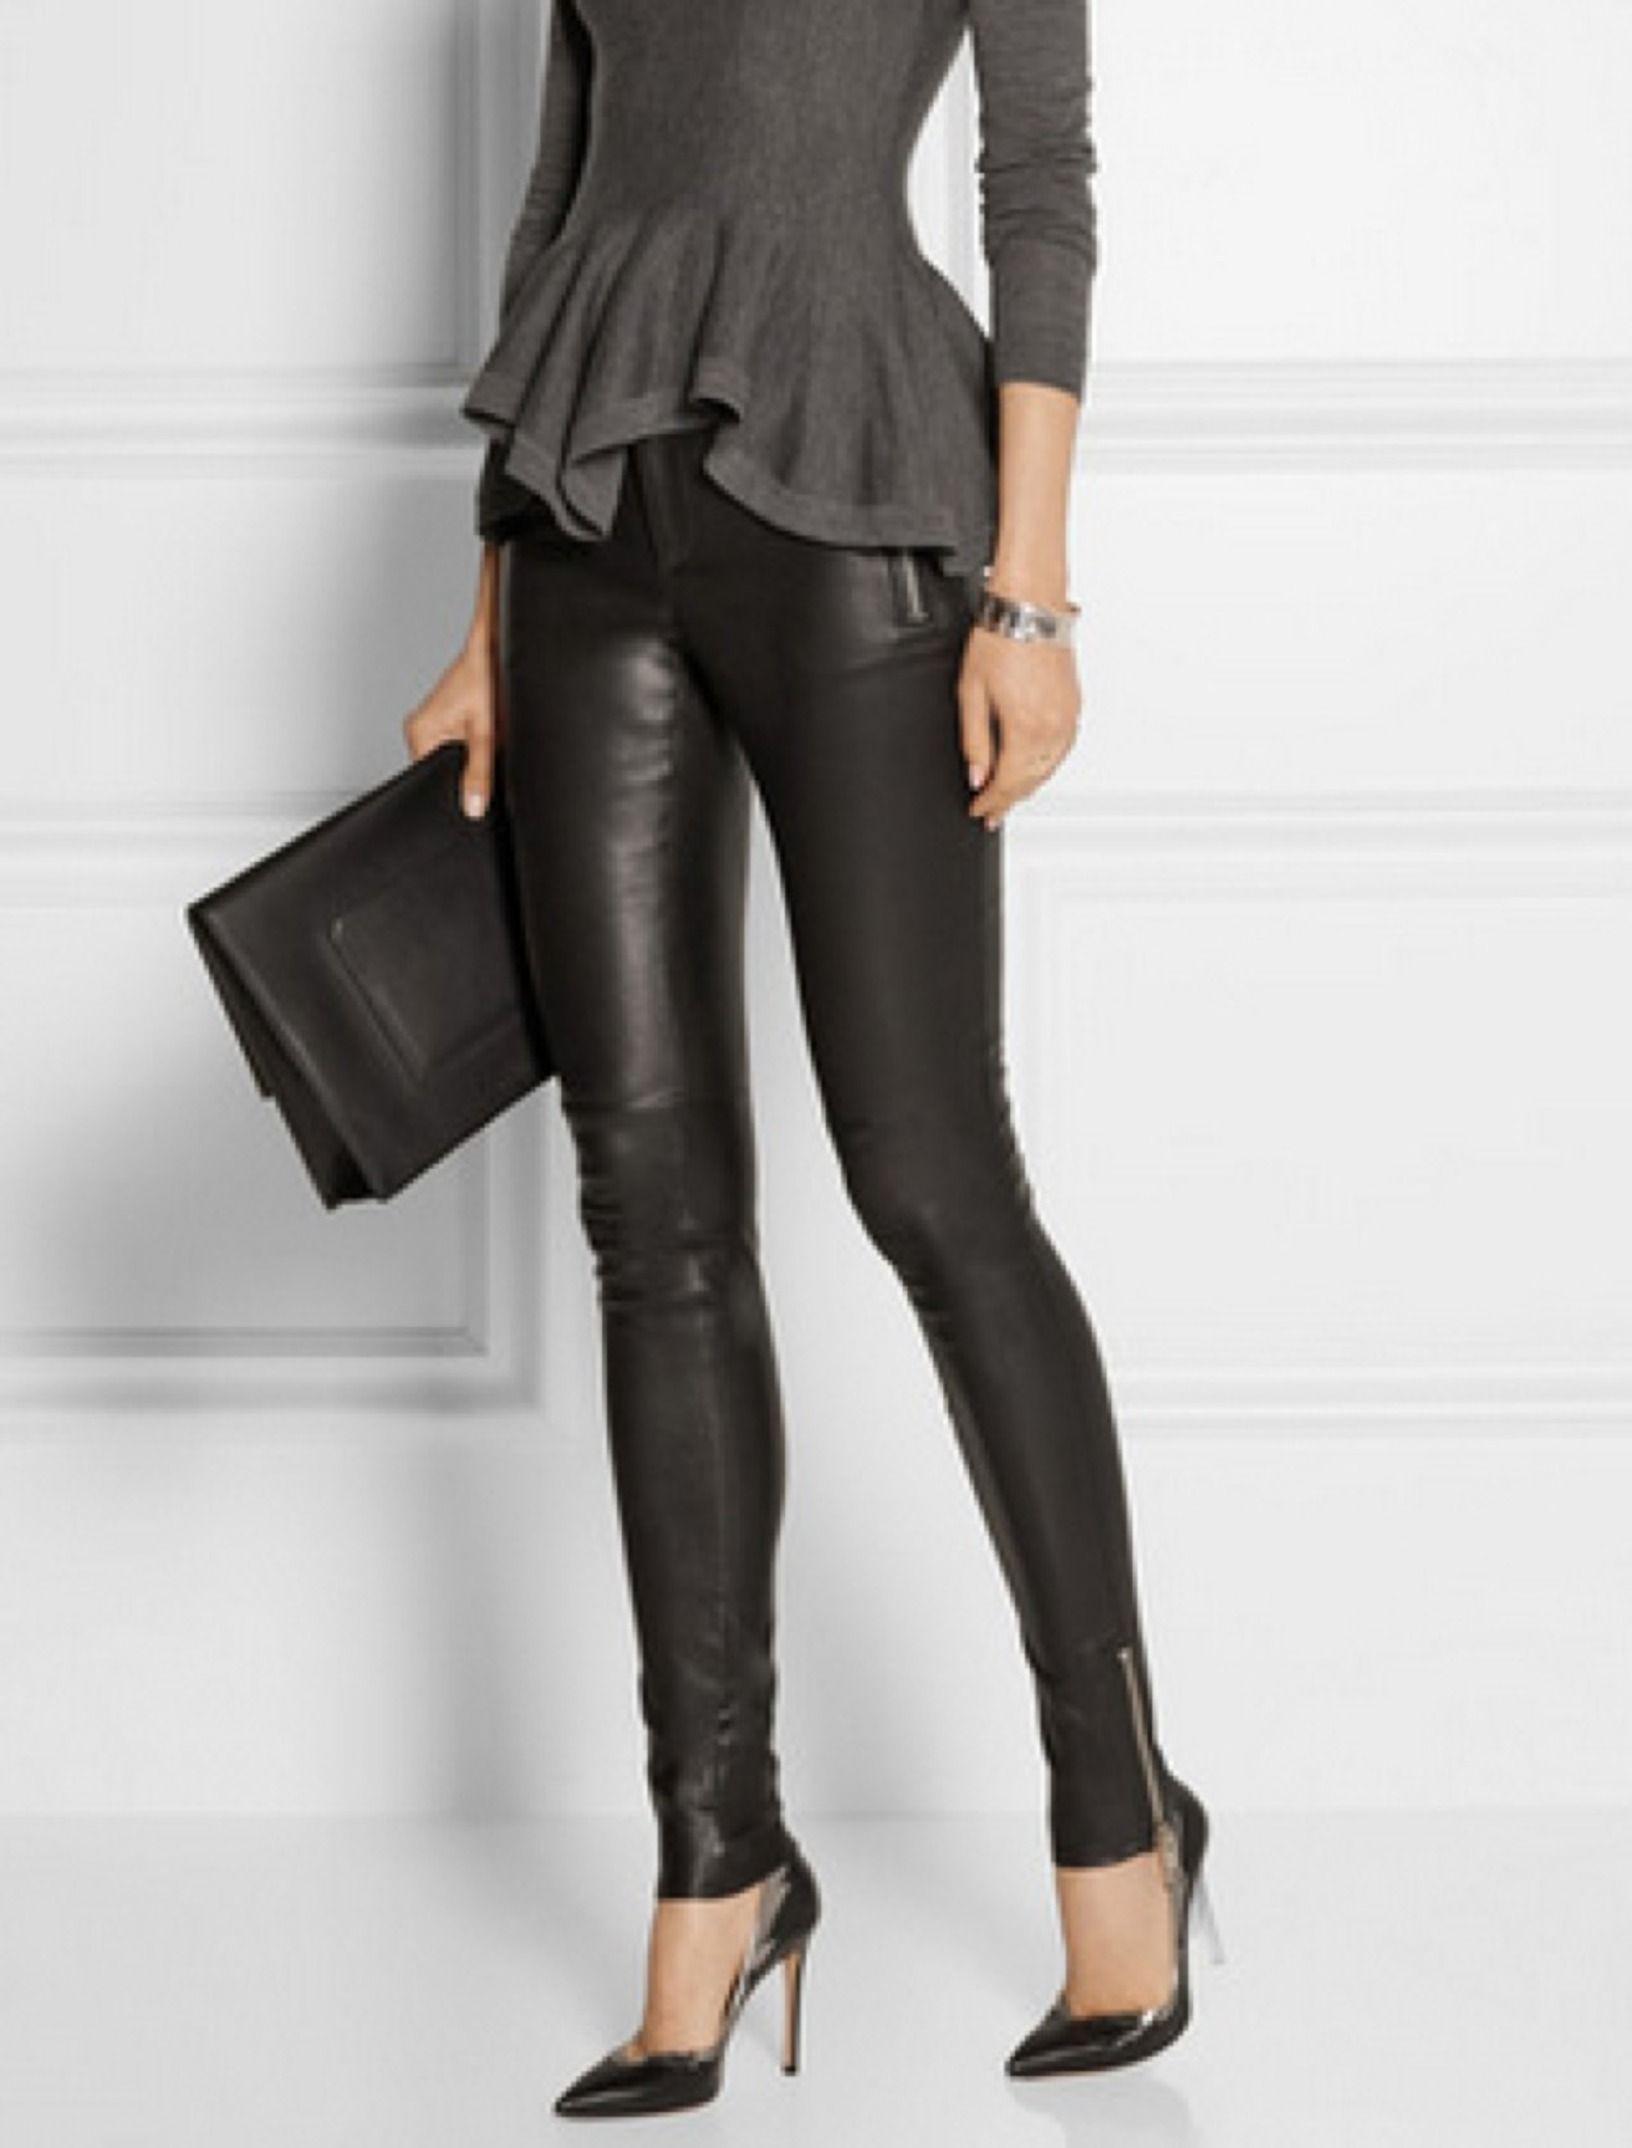 bbf4f95ea3b3 Leather leggins Gucci | Ideas vestuario | Moda, Leggings de cuero y ...